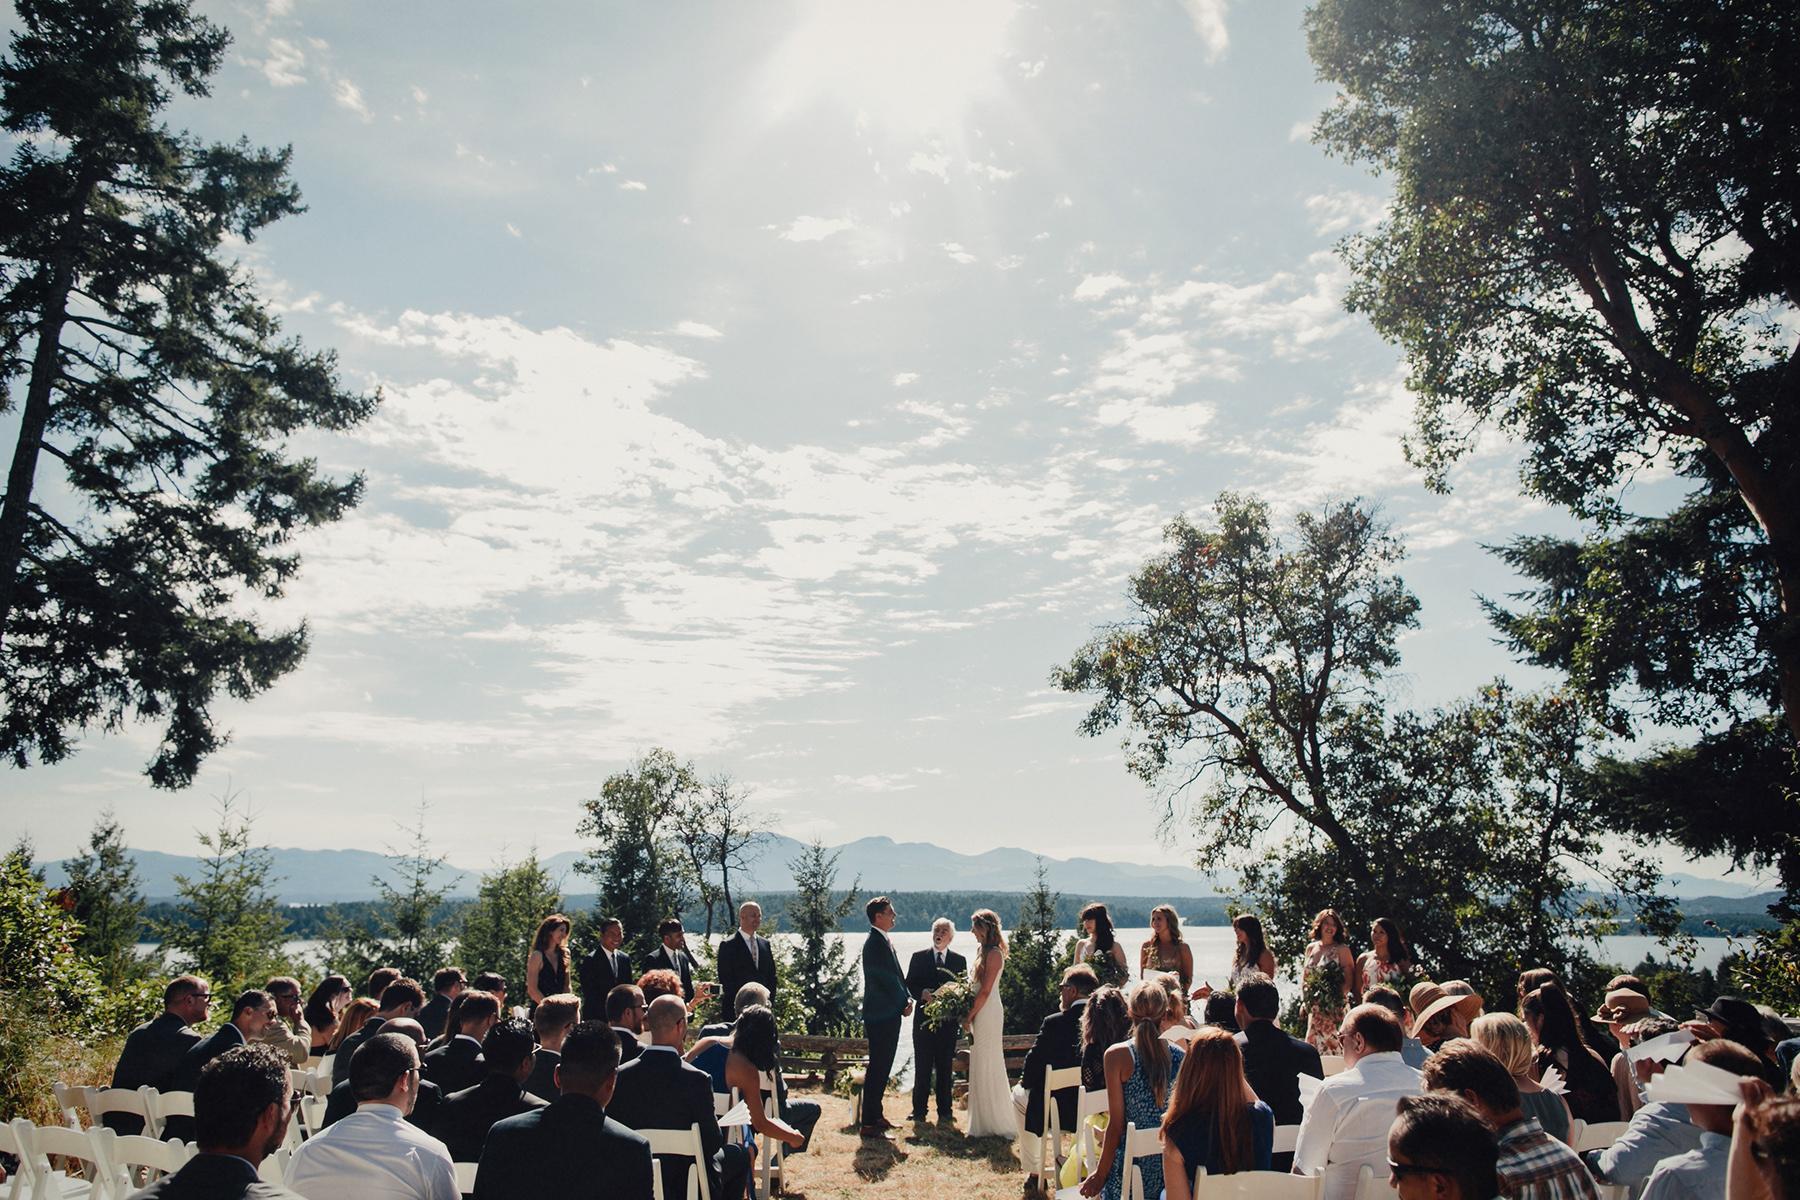 bodega-ridge-wedding-photos-0068.jpg